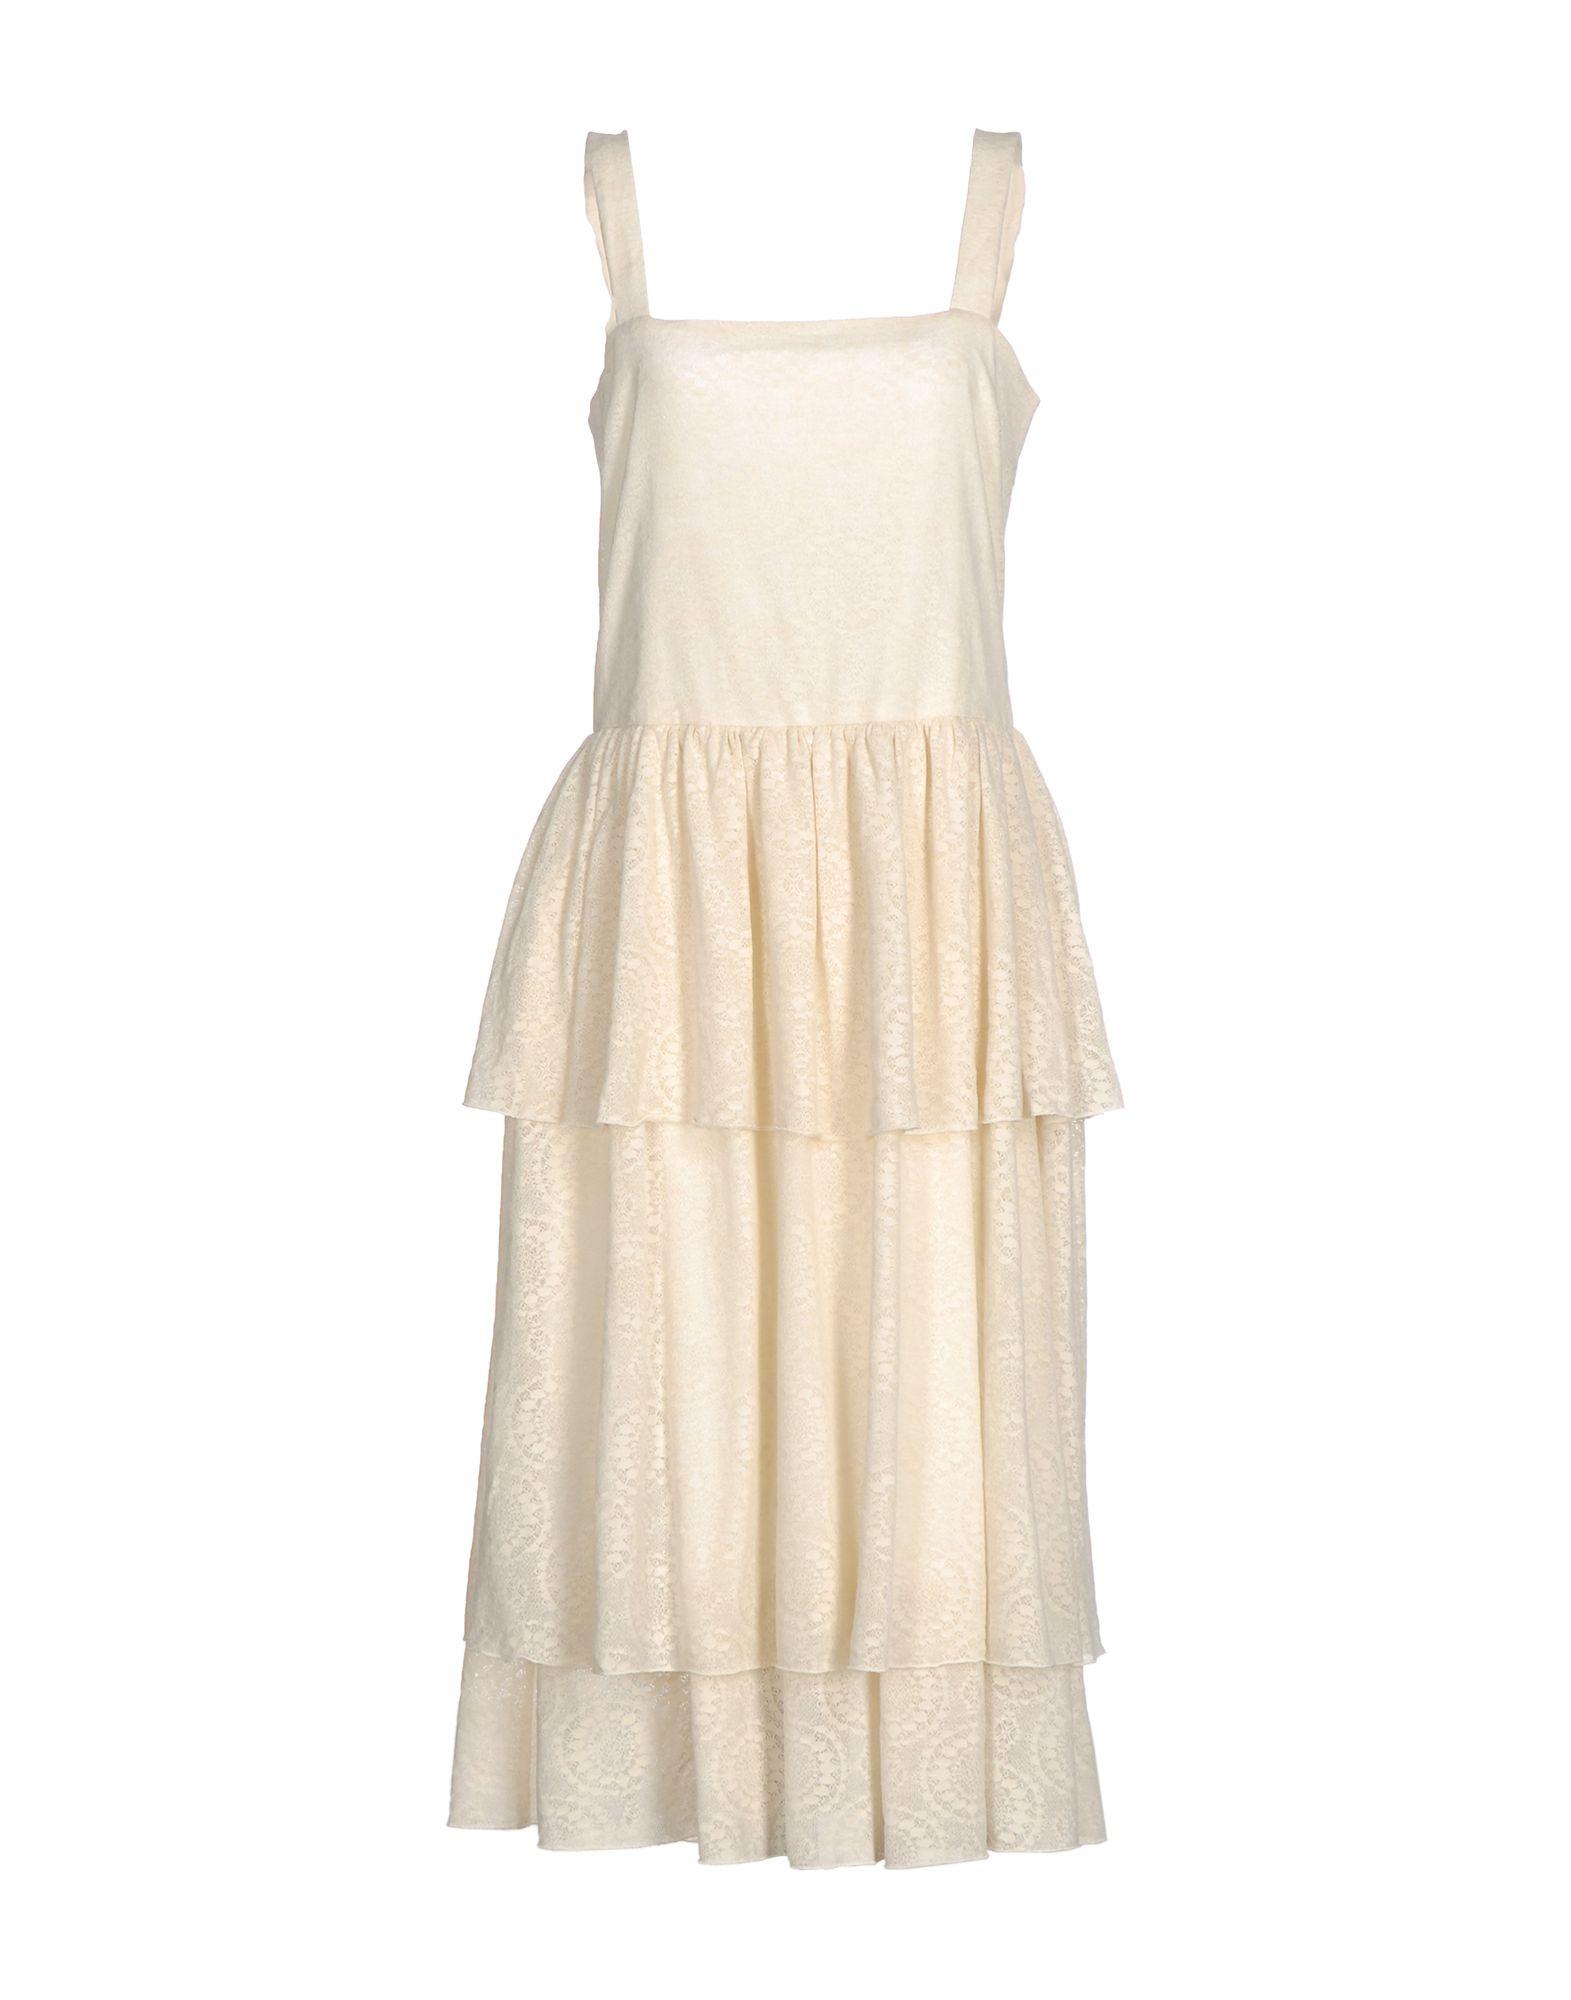 LA KICCA Платье длиной 3/4 беби долл avanua tessie цвет желтый размер s m